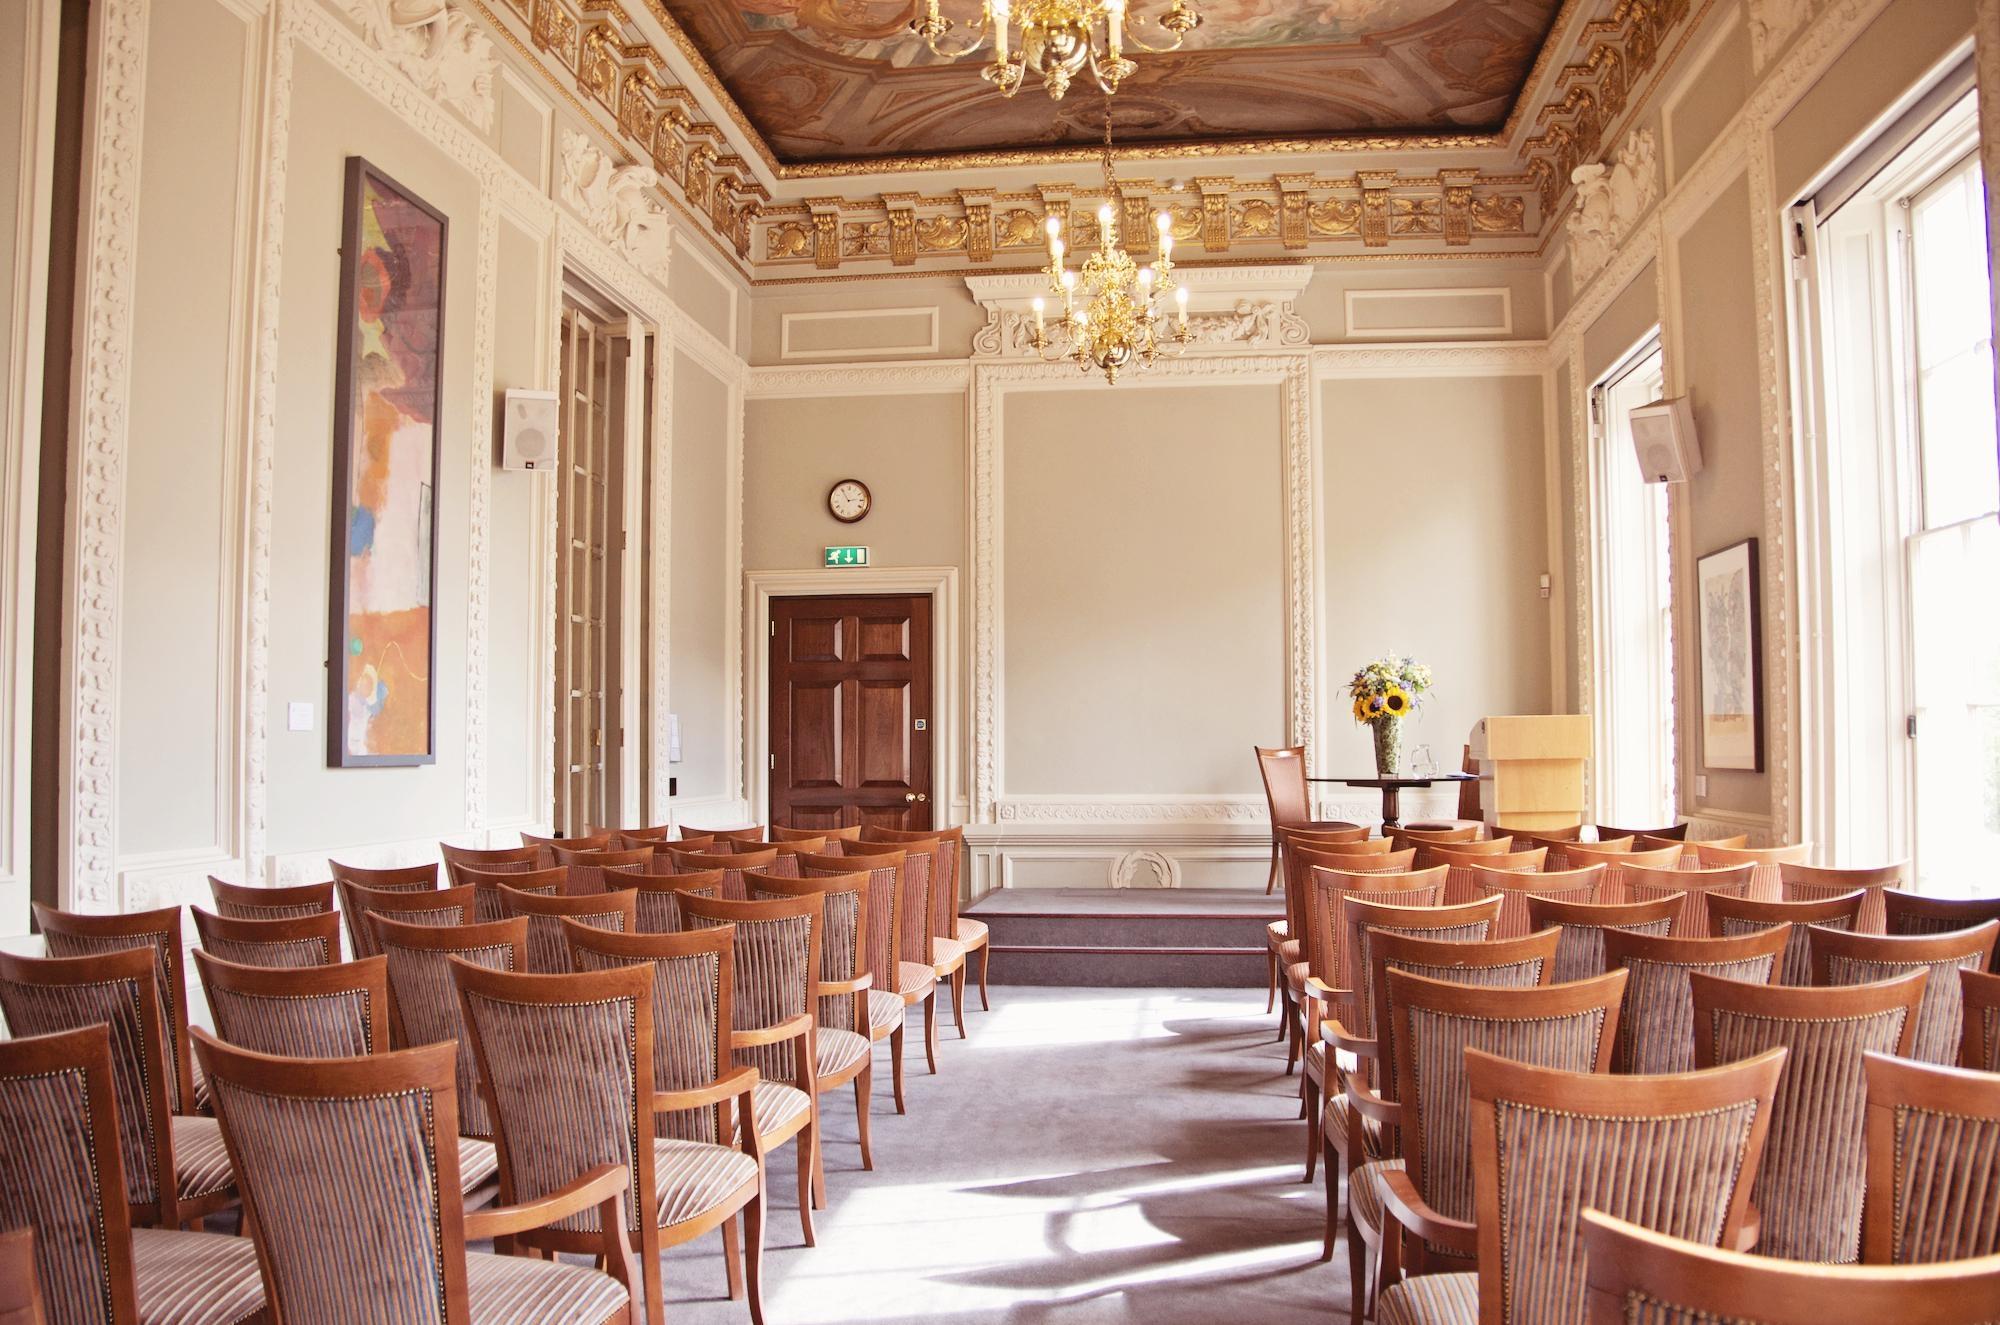 10 - 11 Carlton House Terrace Venue Hire SW1. Private room set up theatre style